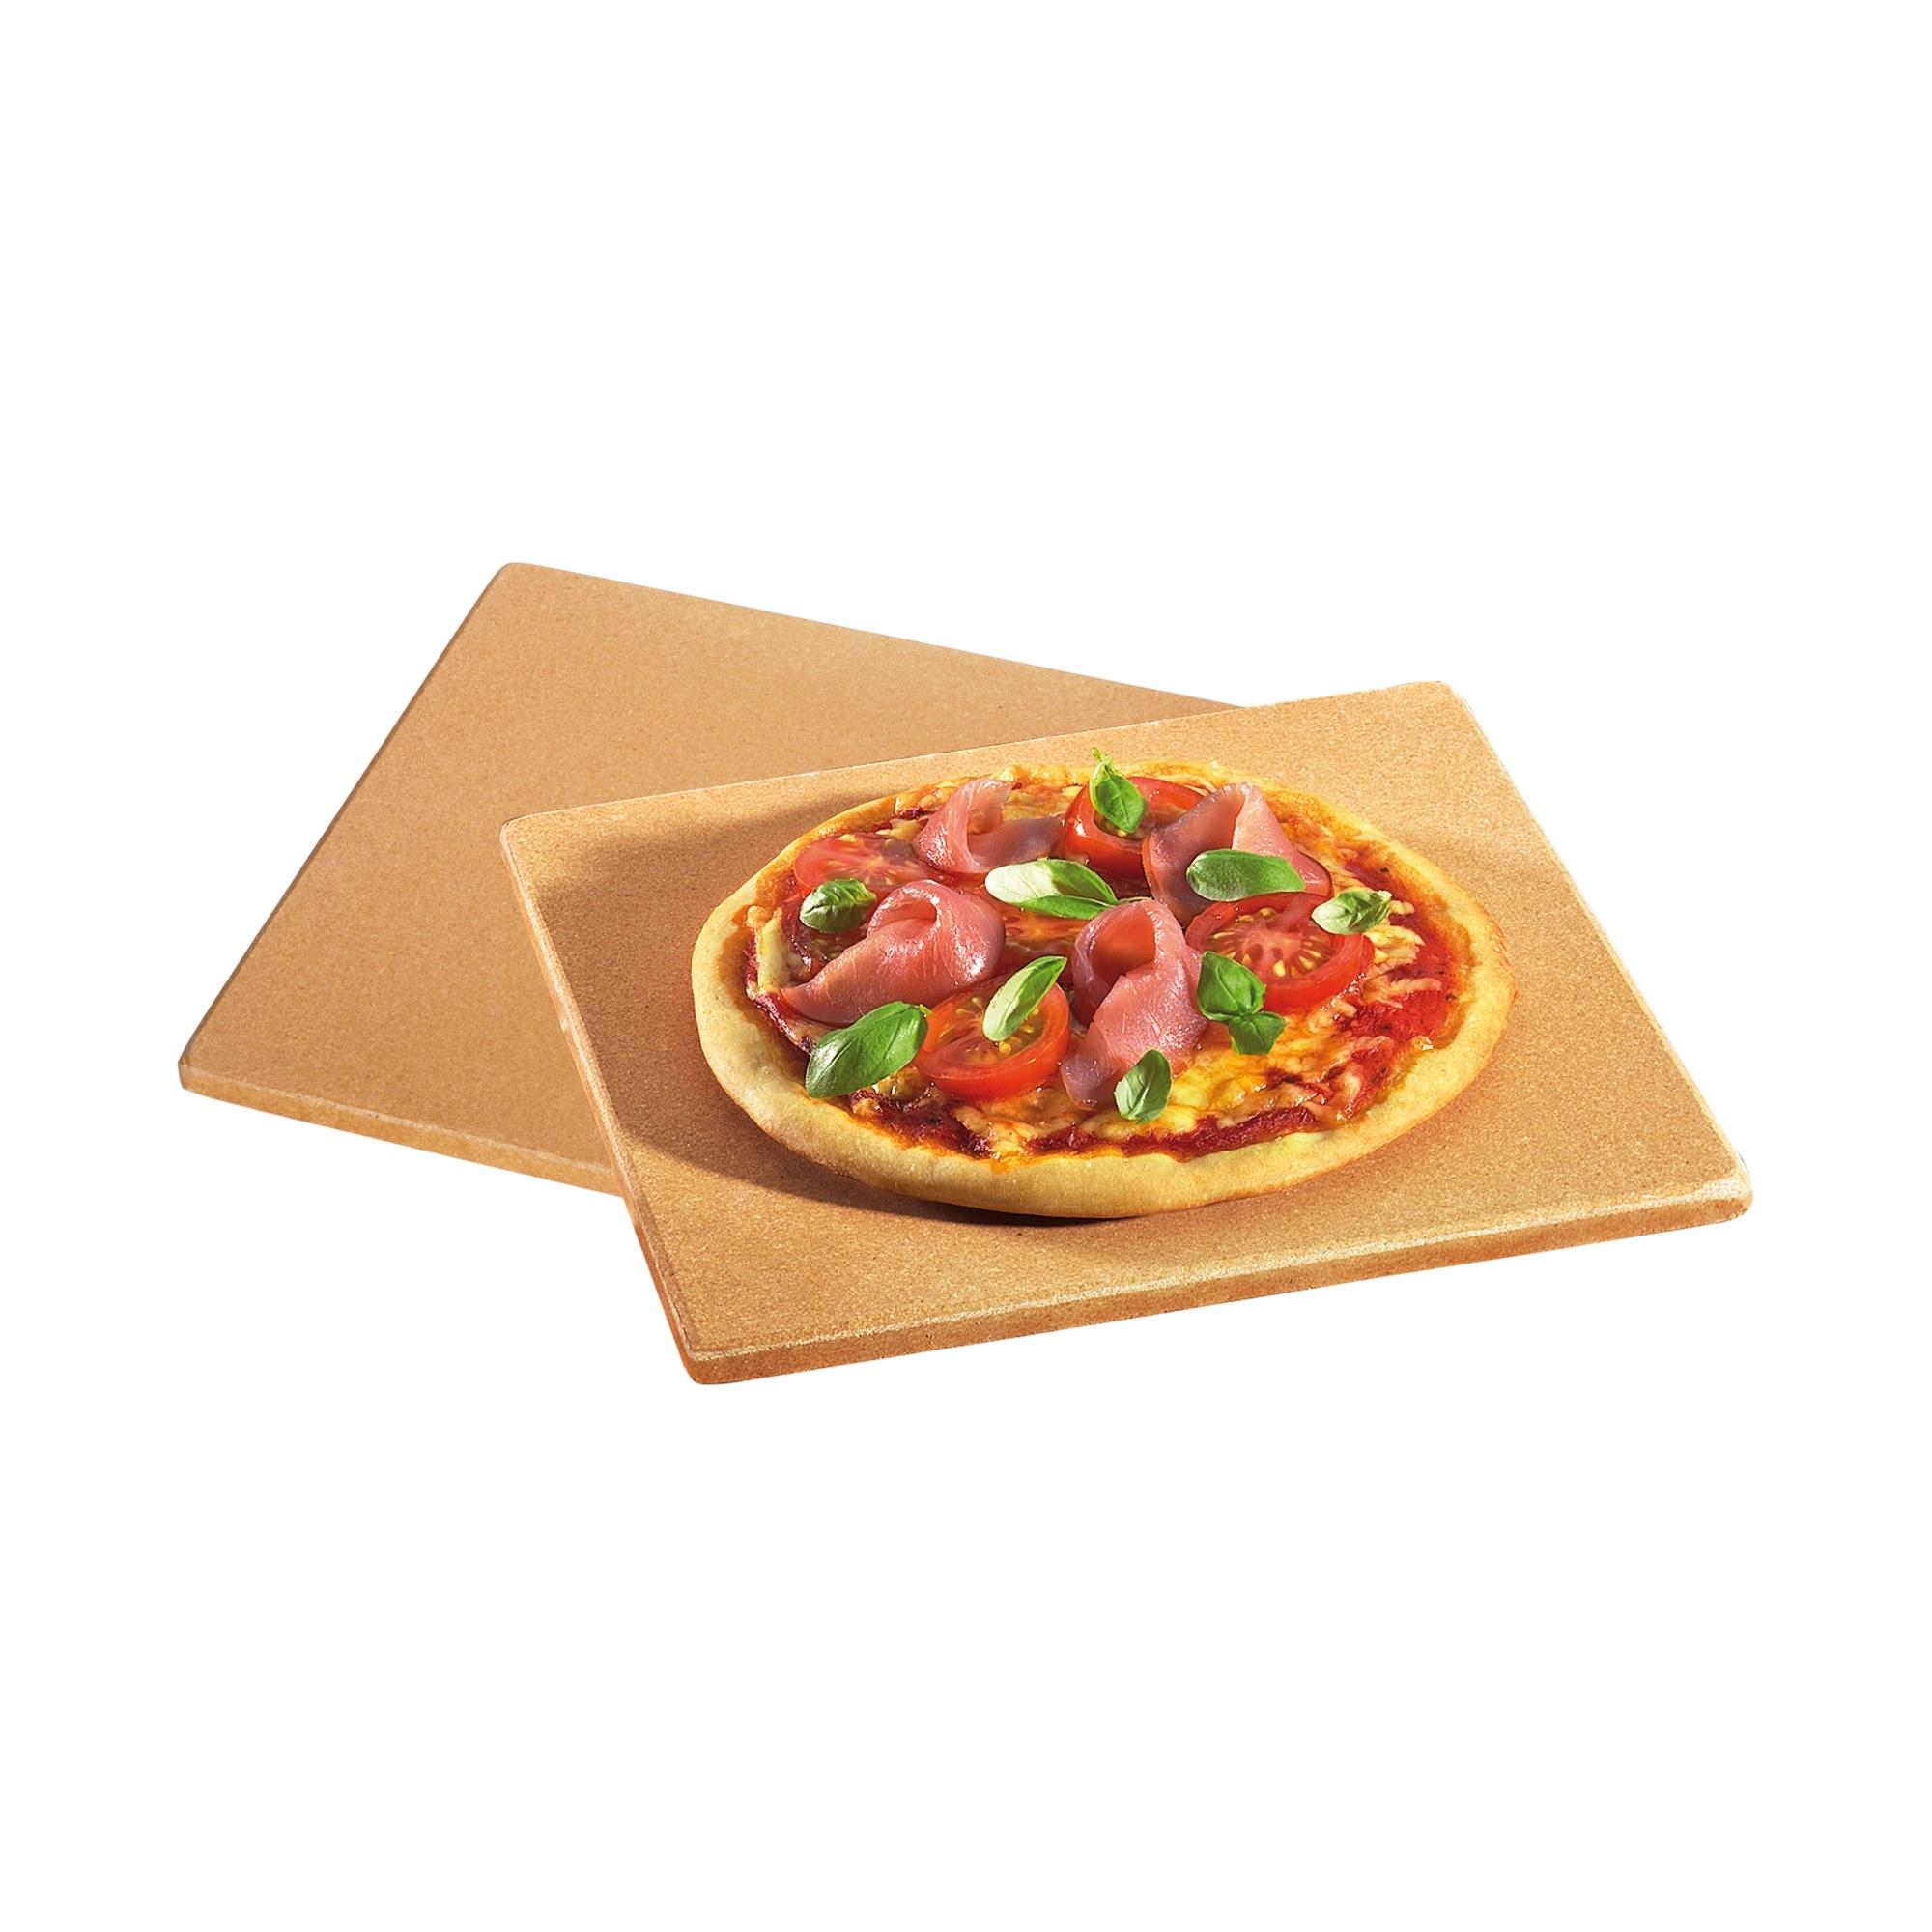 KÜCHENPROFI Mini Pizzastein 2er Set 19 x 19 cm Grillstein